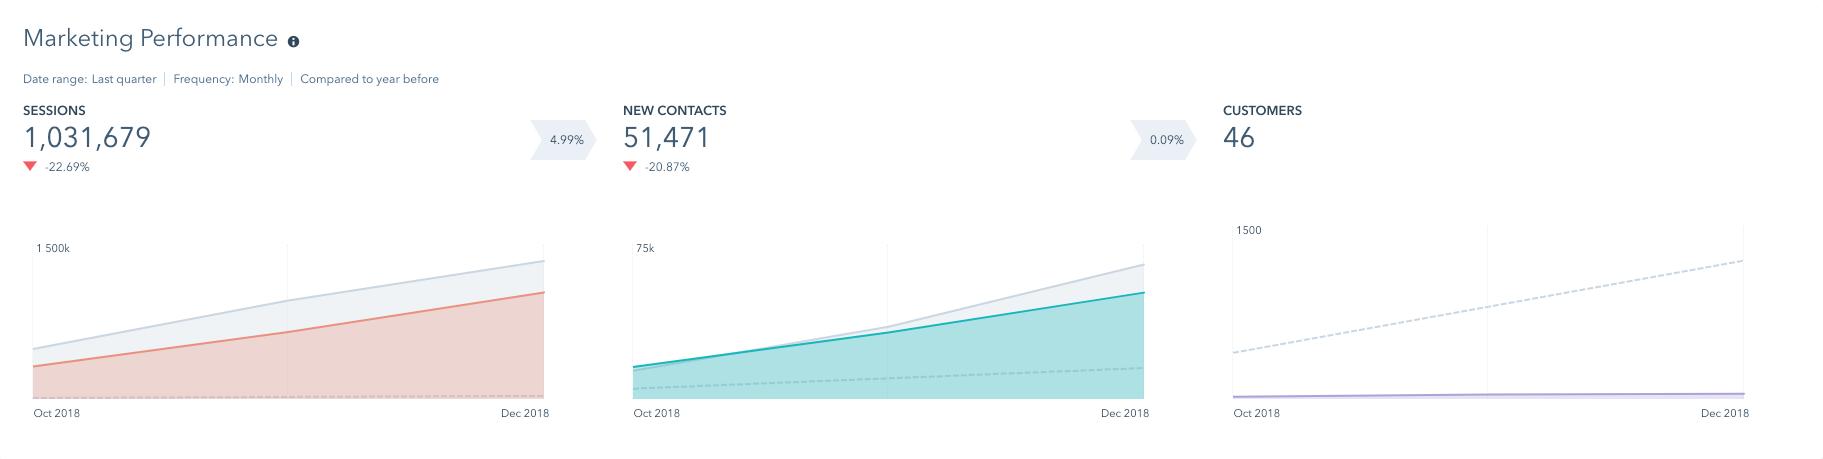 gráfica de desempeño de marketing